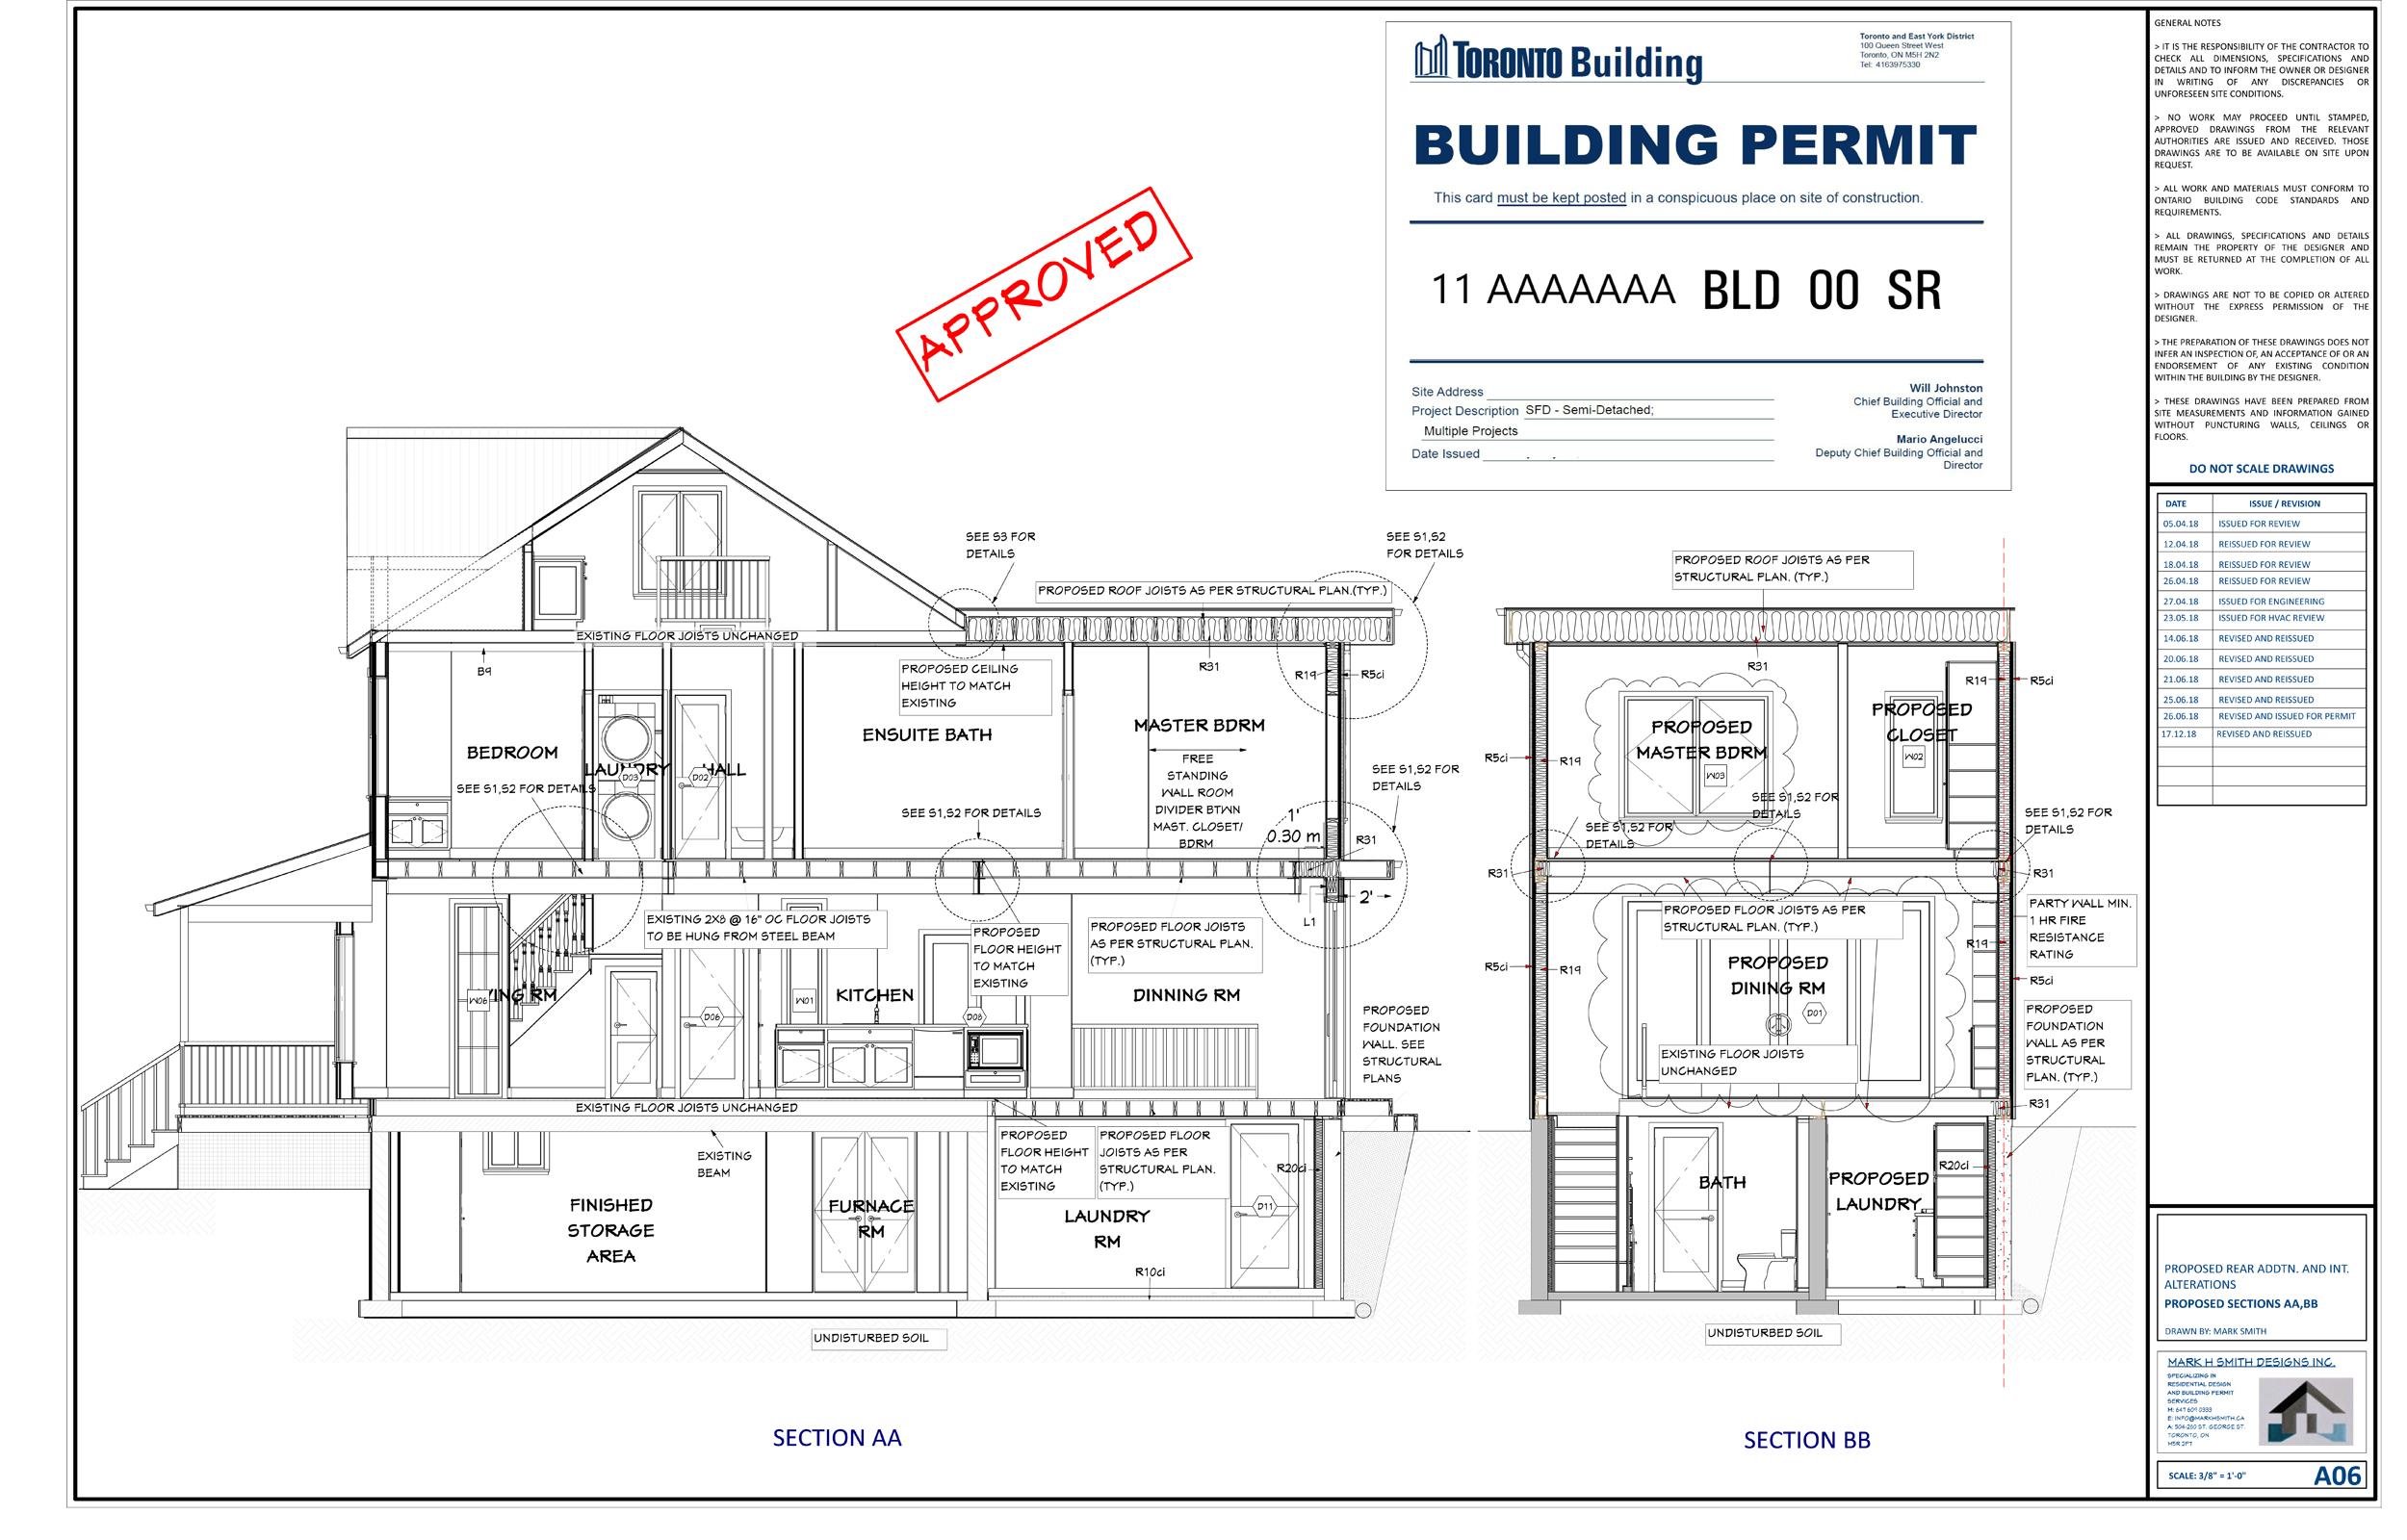 Toronto Building Permit Drawings